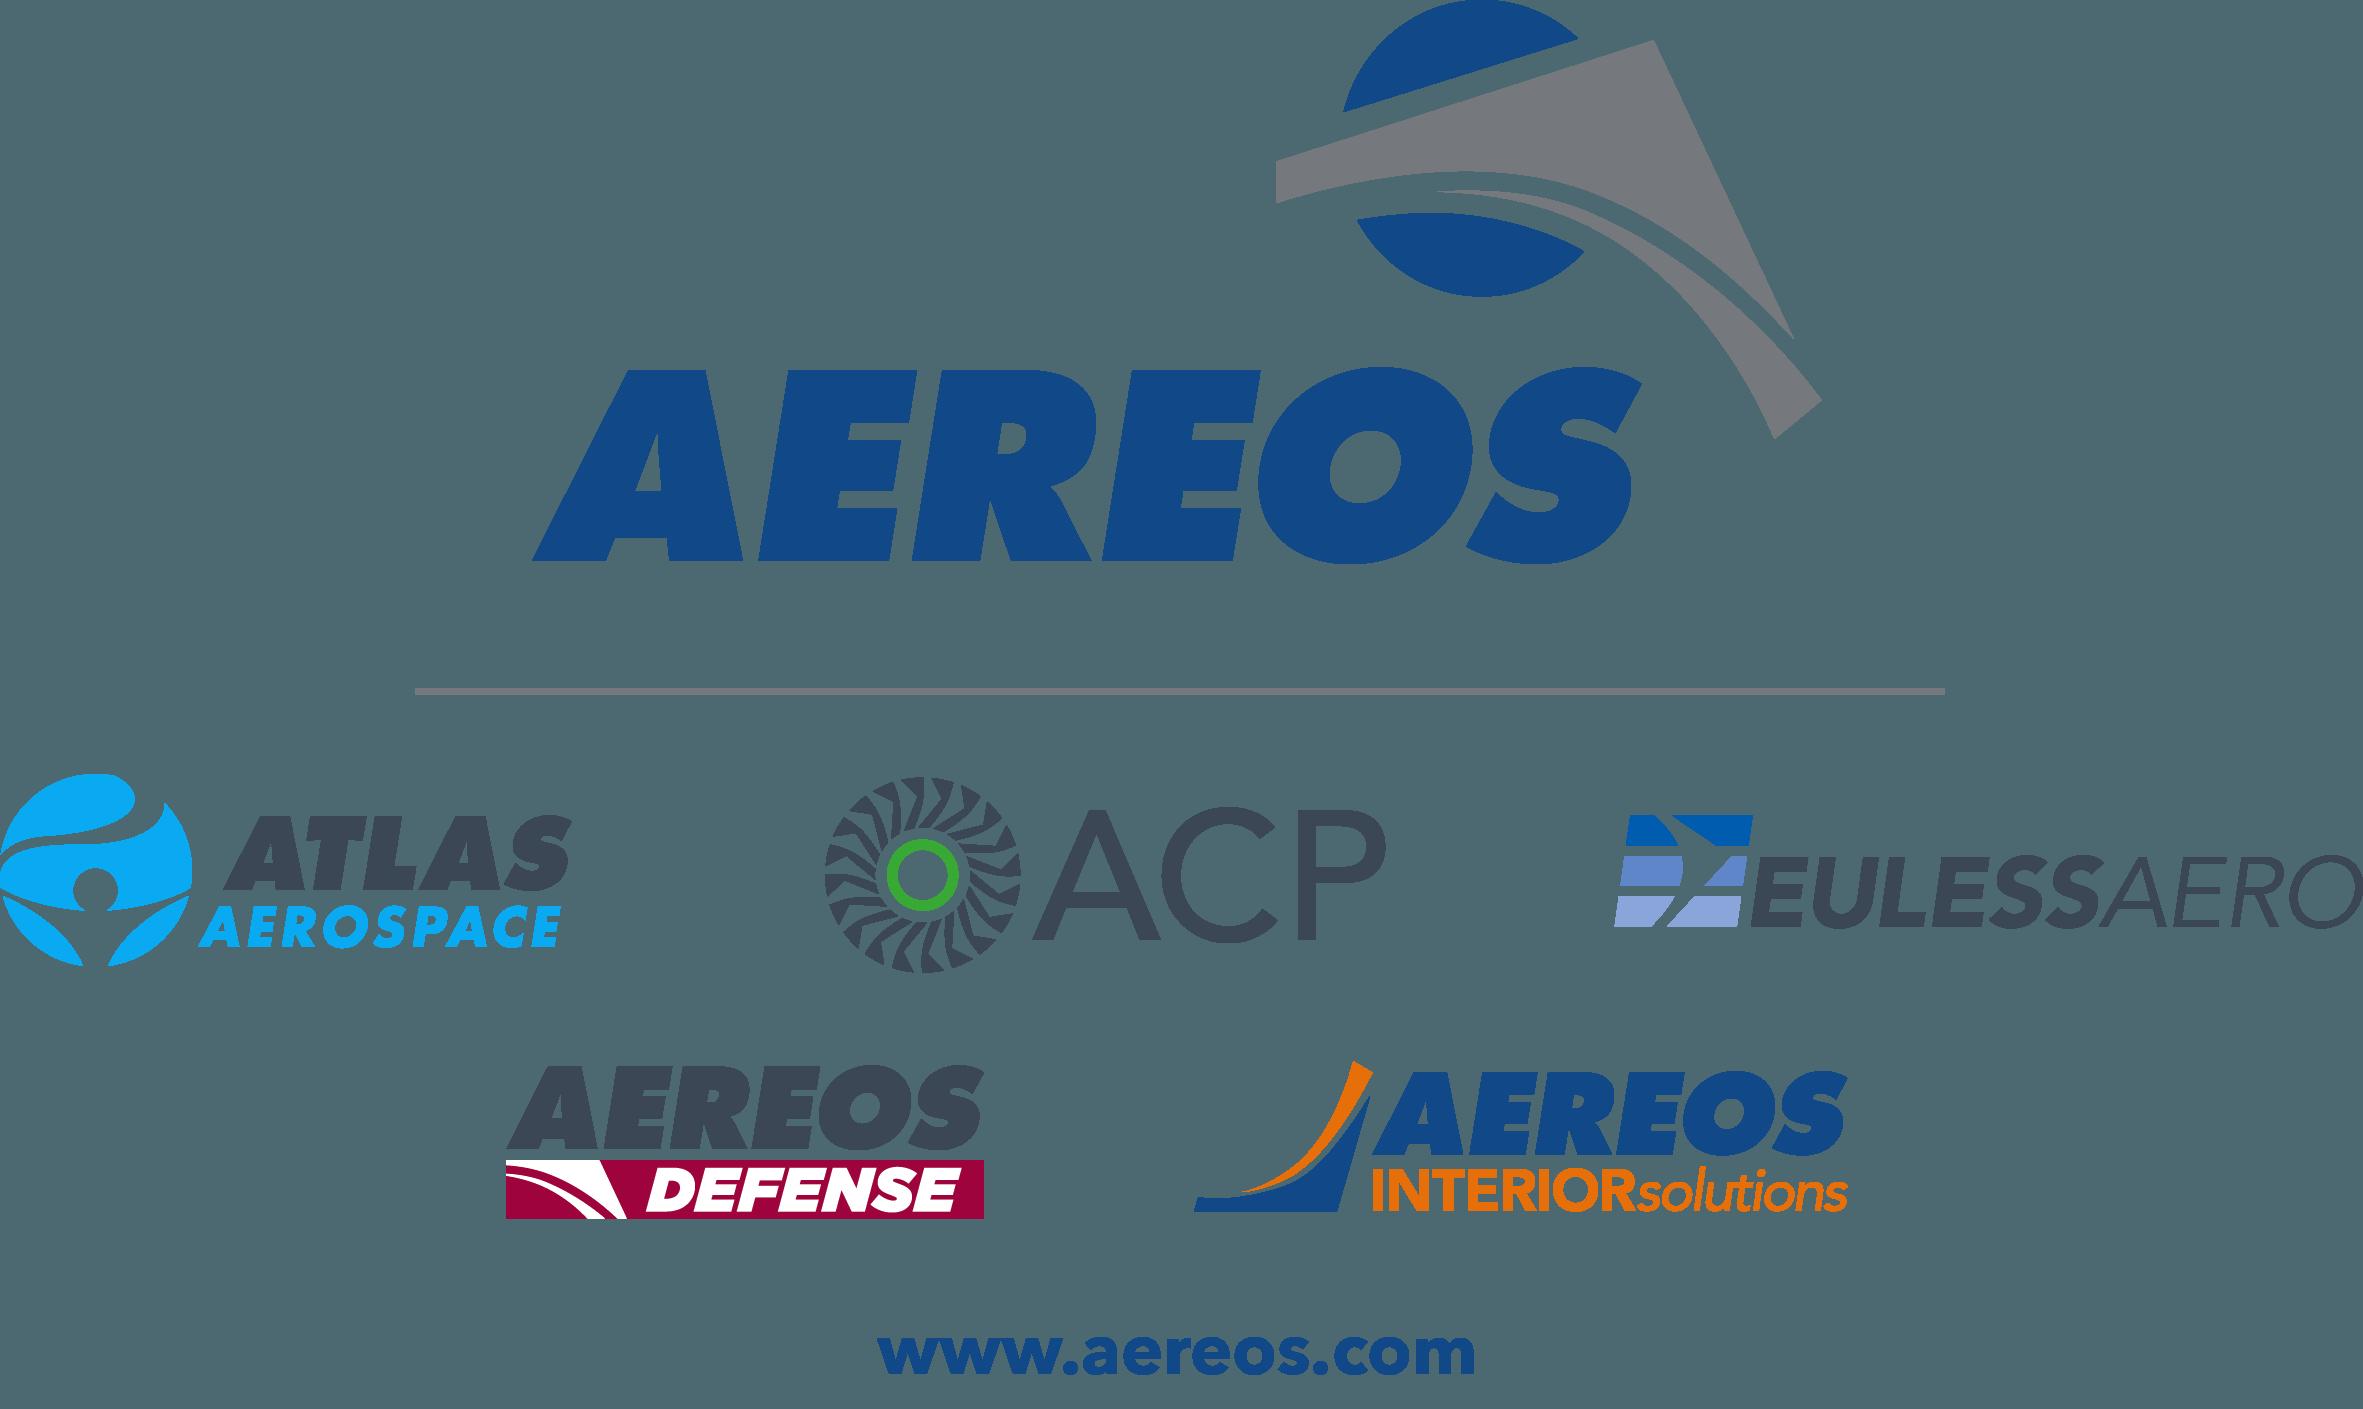 Aereos Group Grows Again, Adding Aereos Interior Solutions